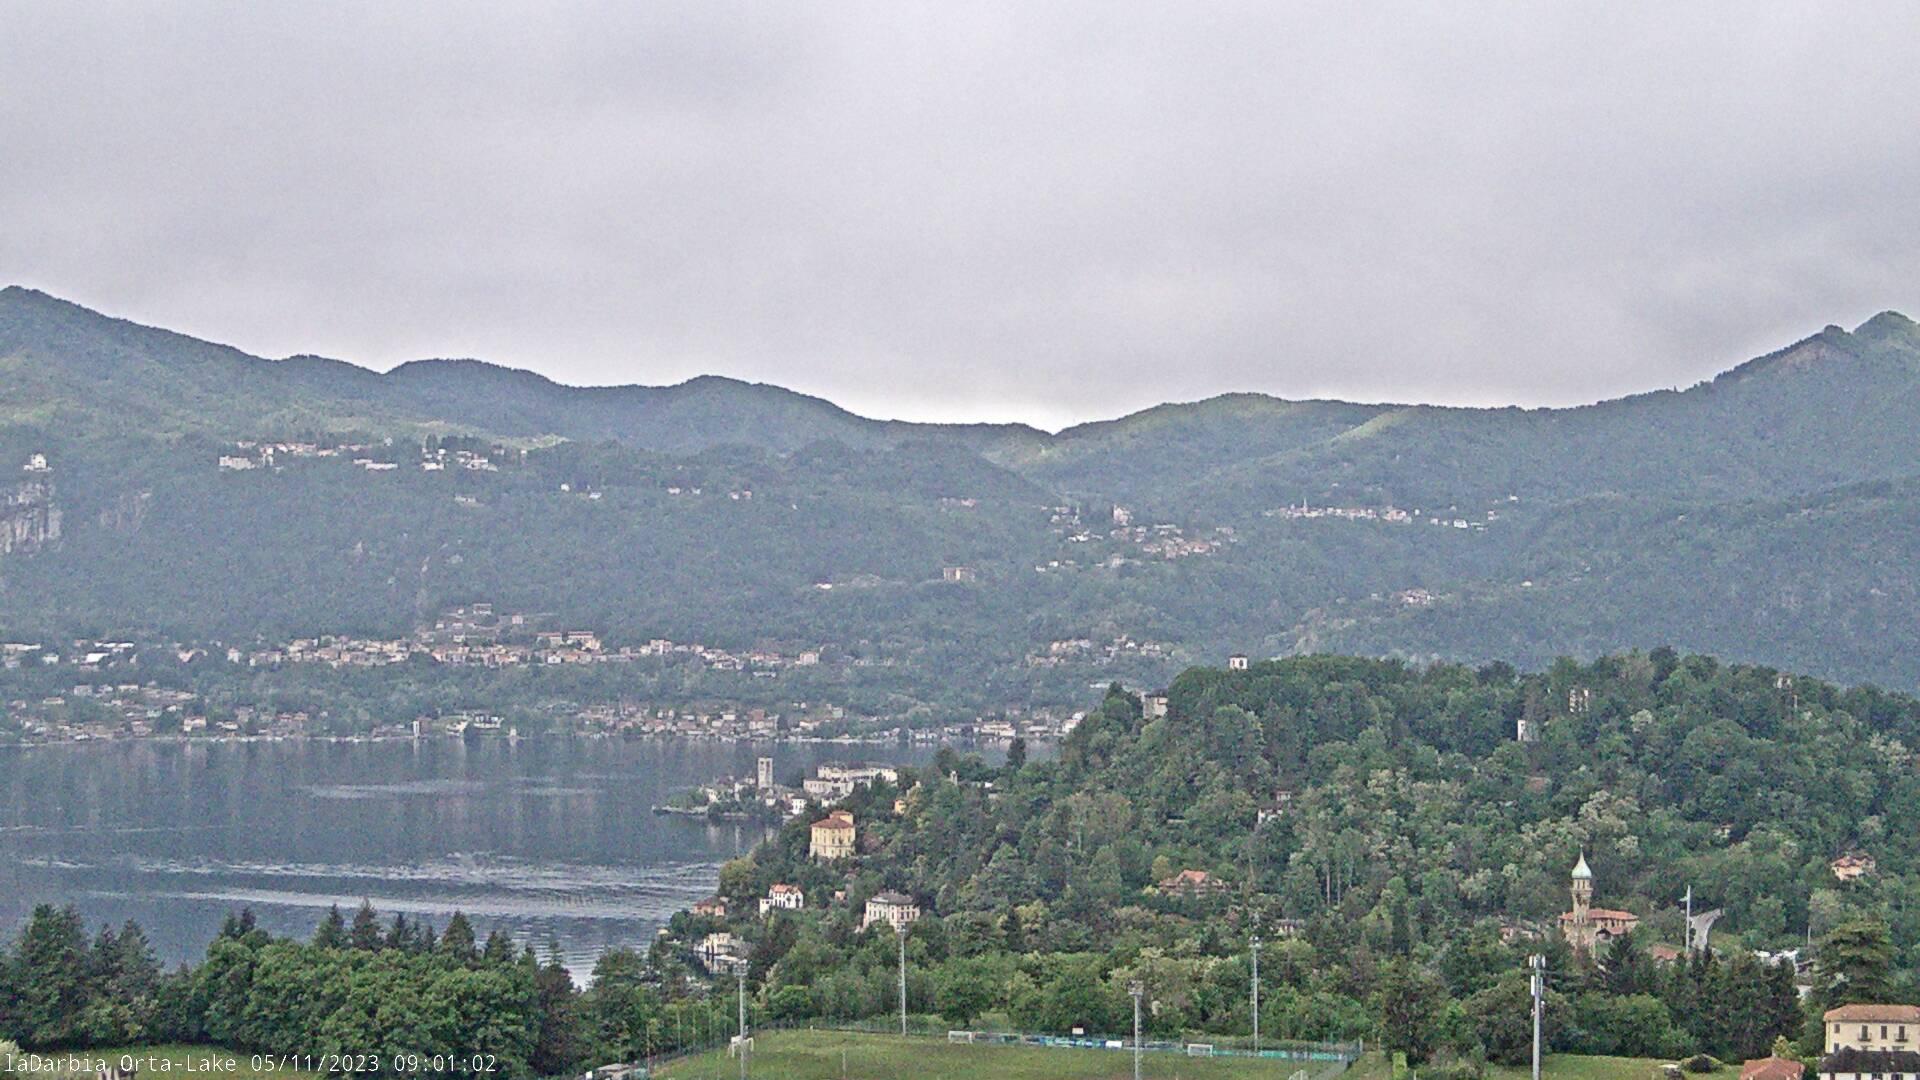 Webcam lago d'orta